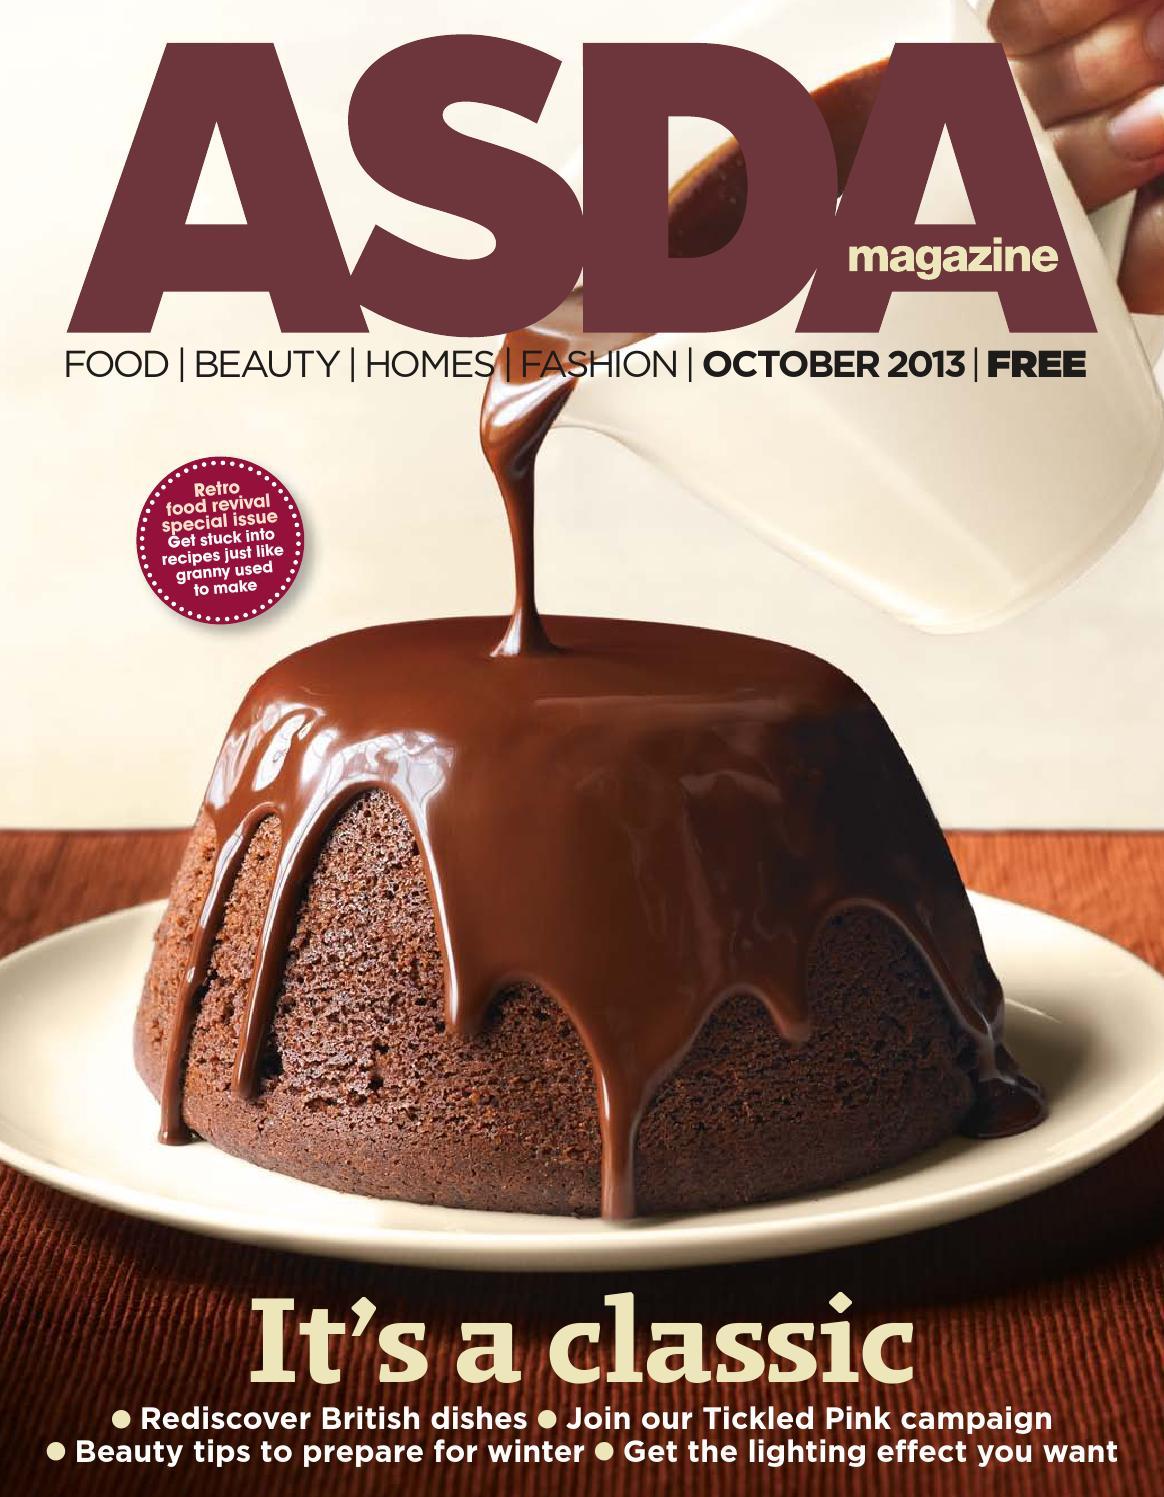 Asda easter chocolate cake recipe